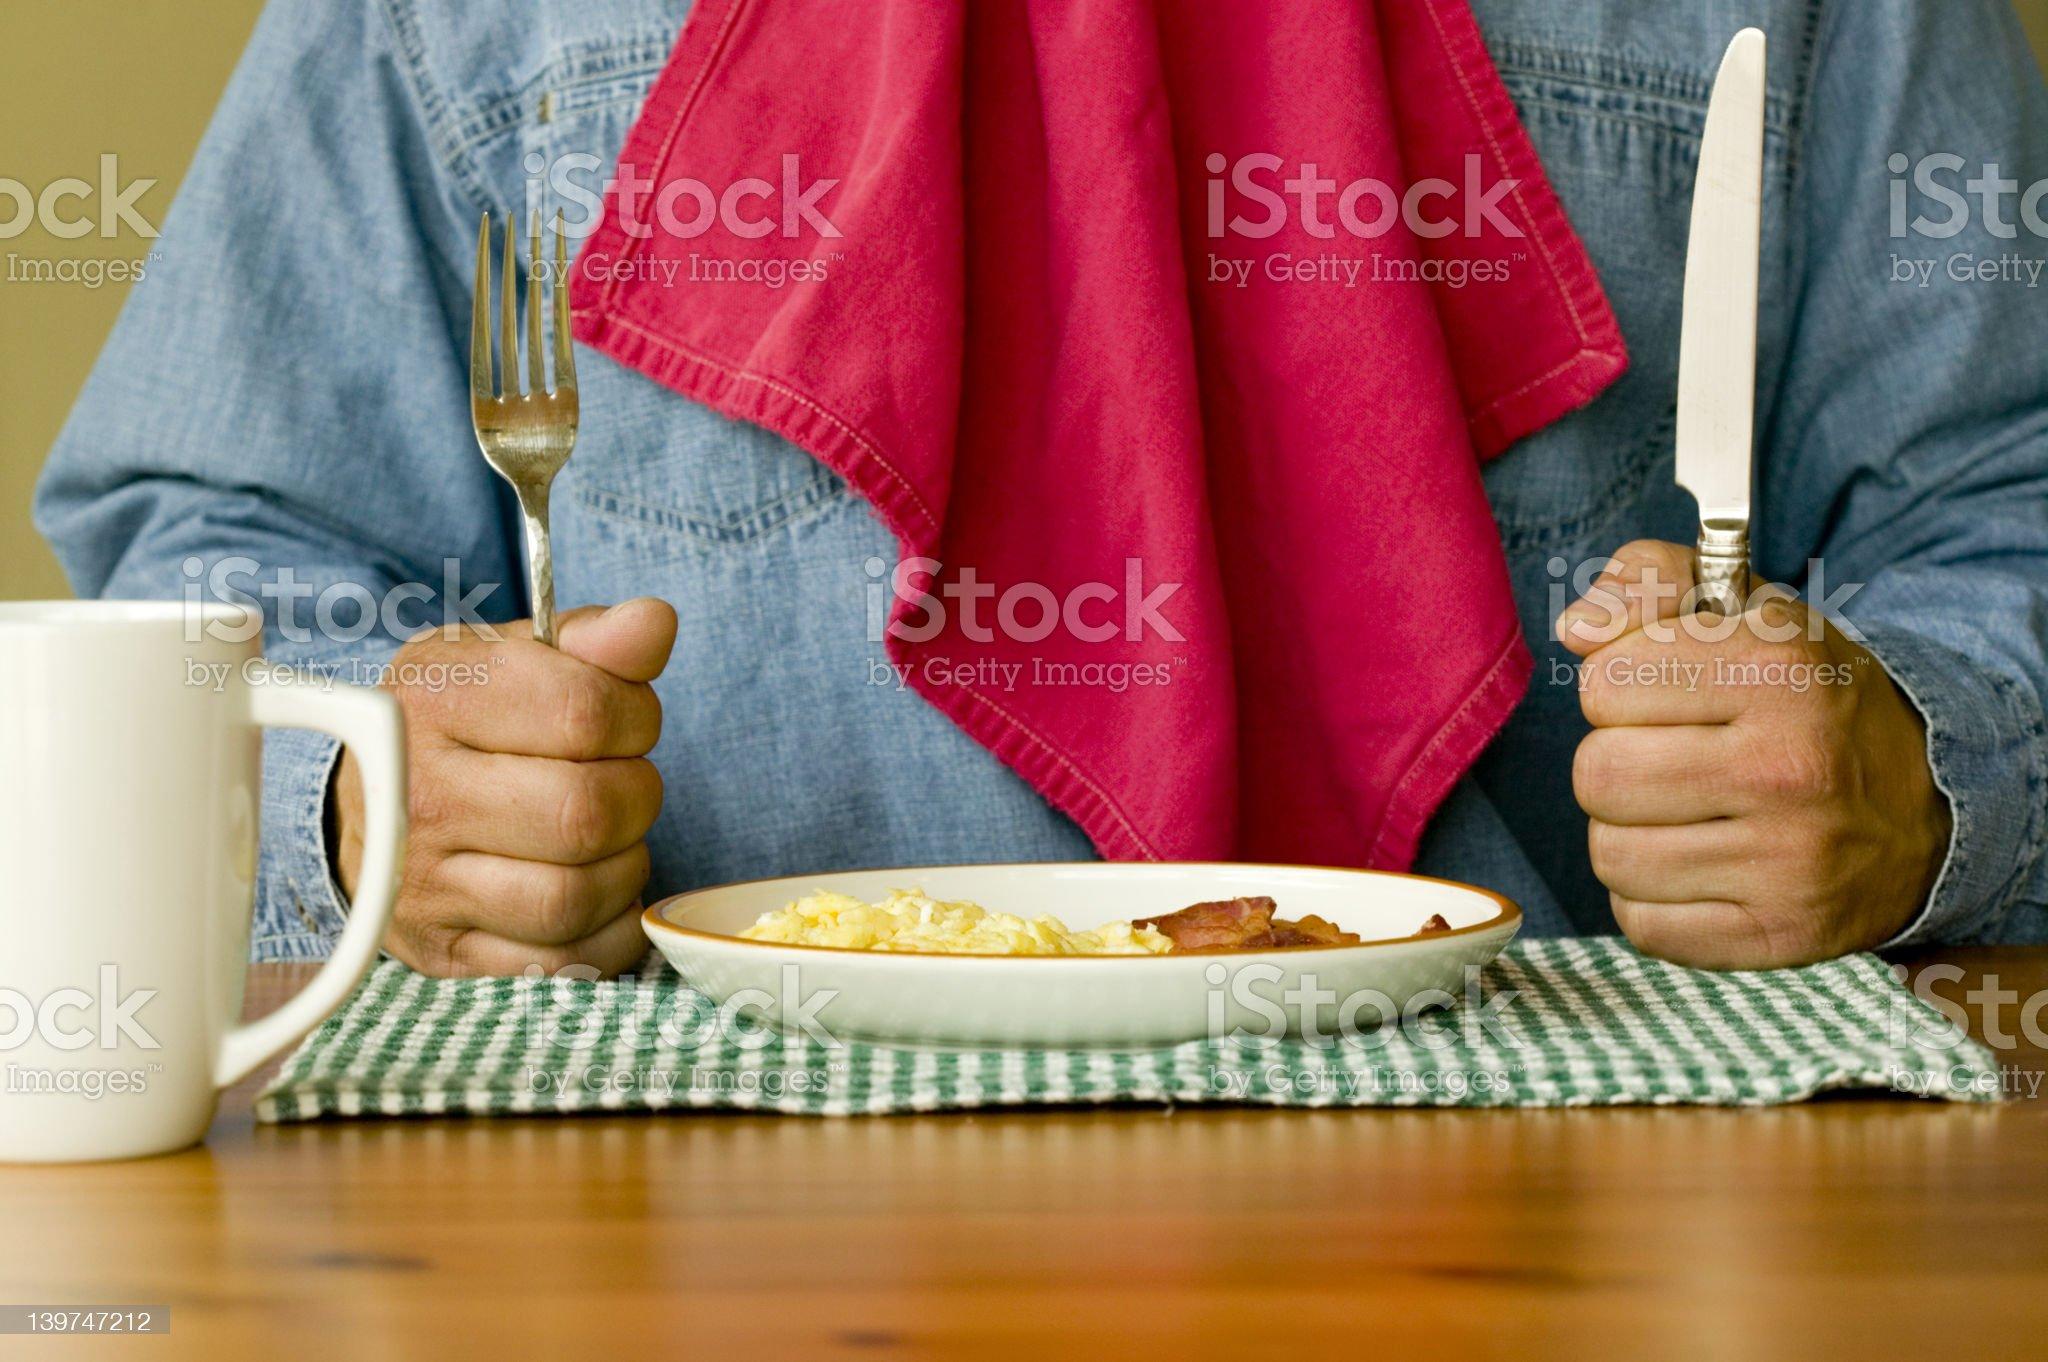 Ready For Breakfast royalty-free stock photo